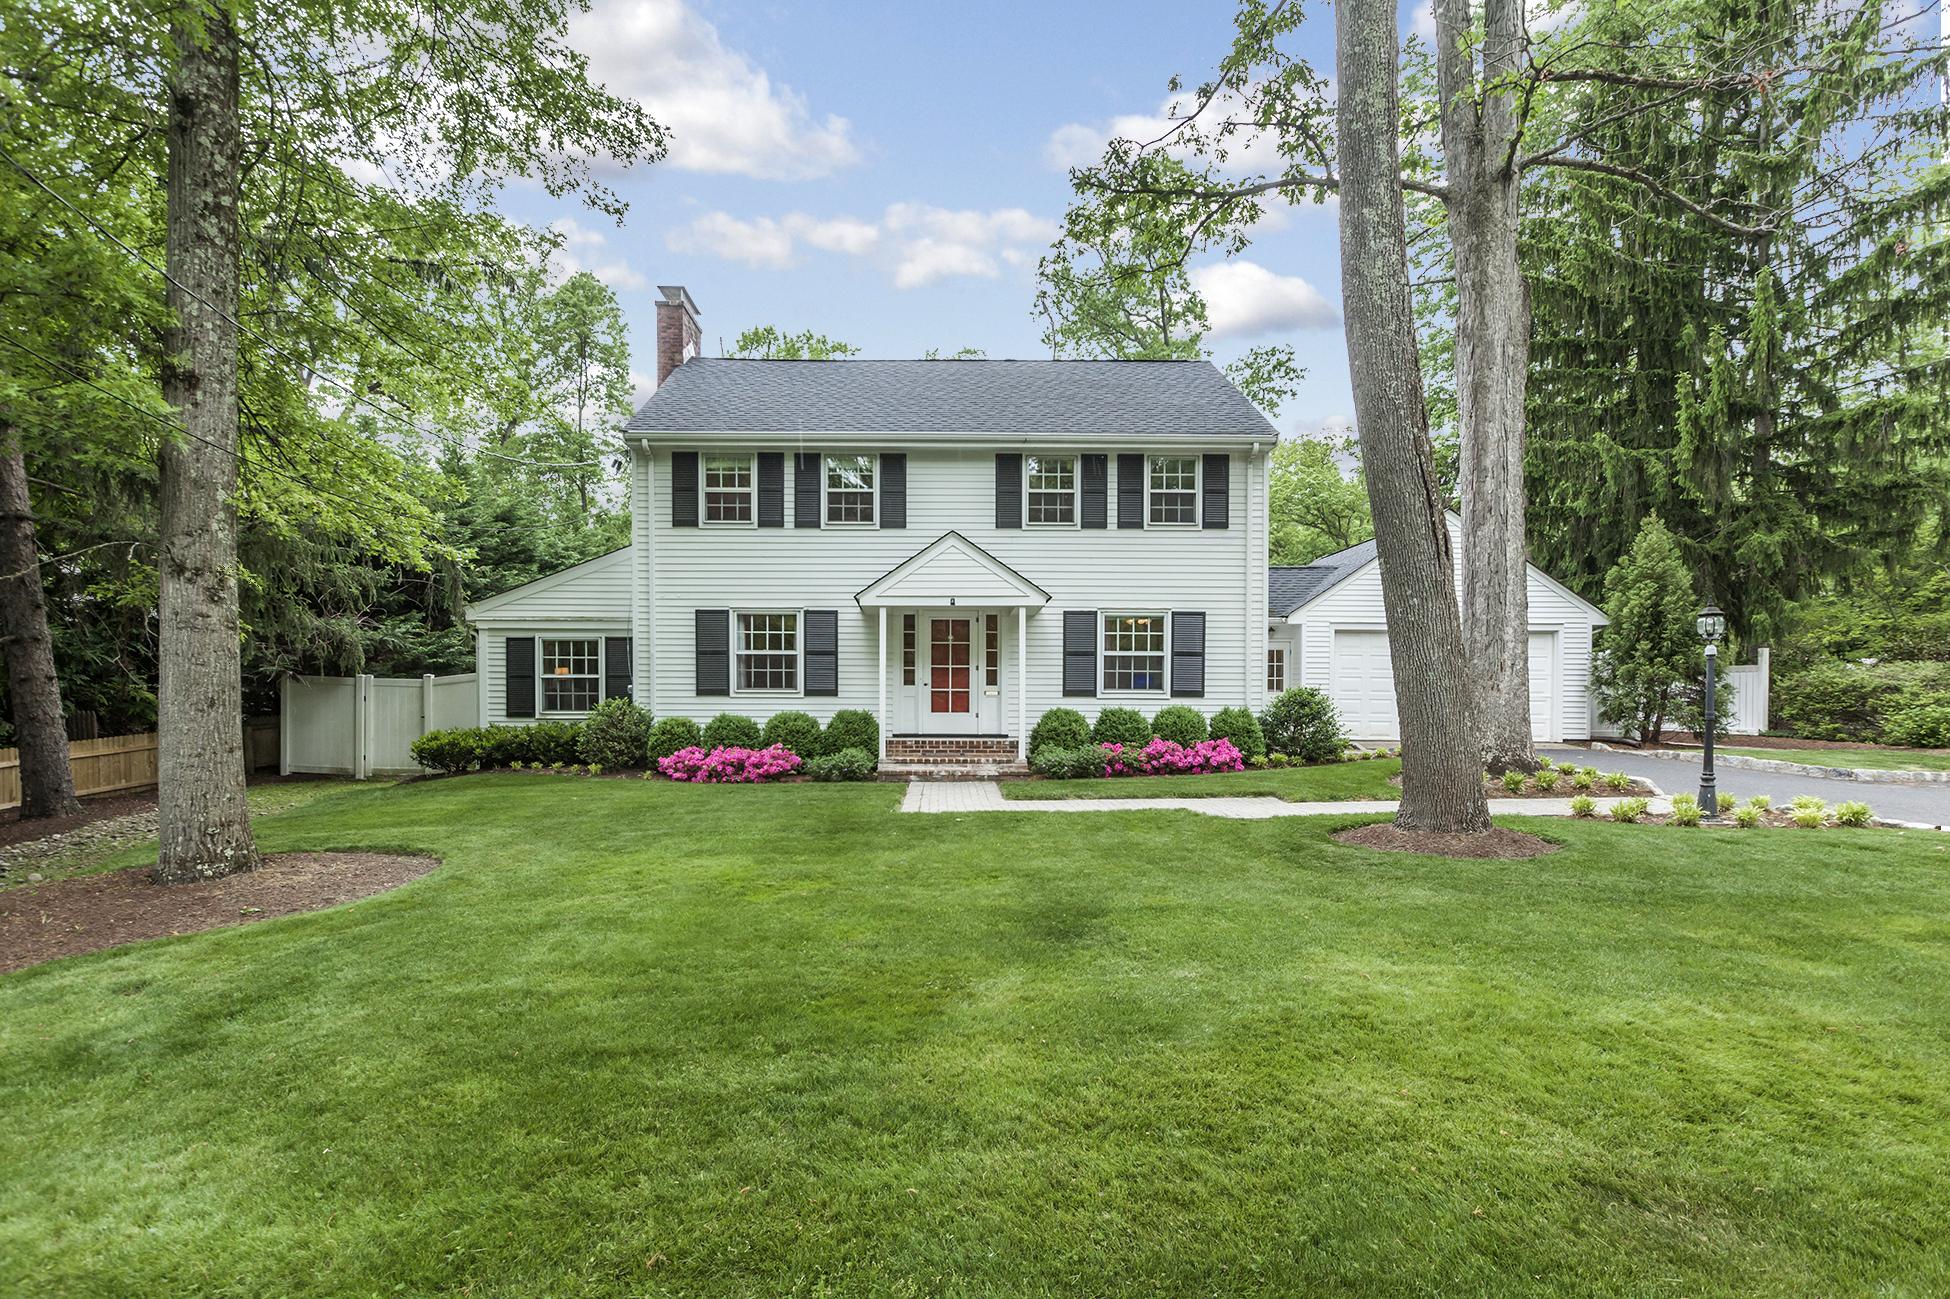 独户住宅 为 销售 在 Updated Colonial Near The Heart Of Princeton 188 State Road Princeton, 新泽西州 08540 美国